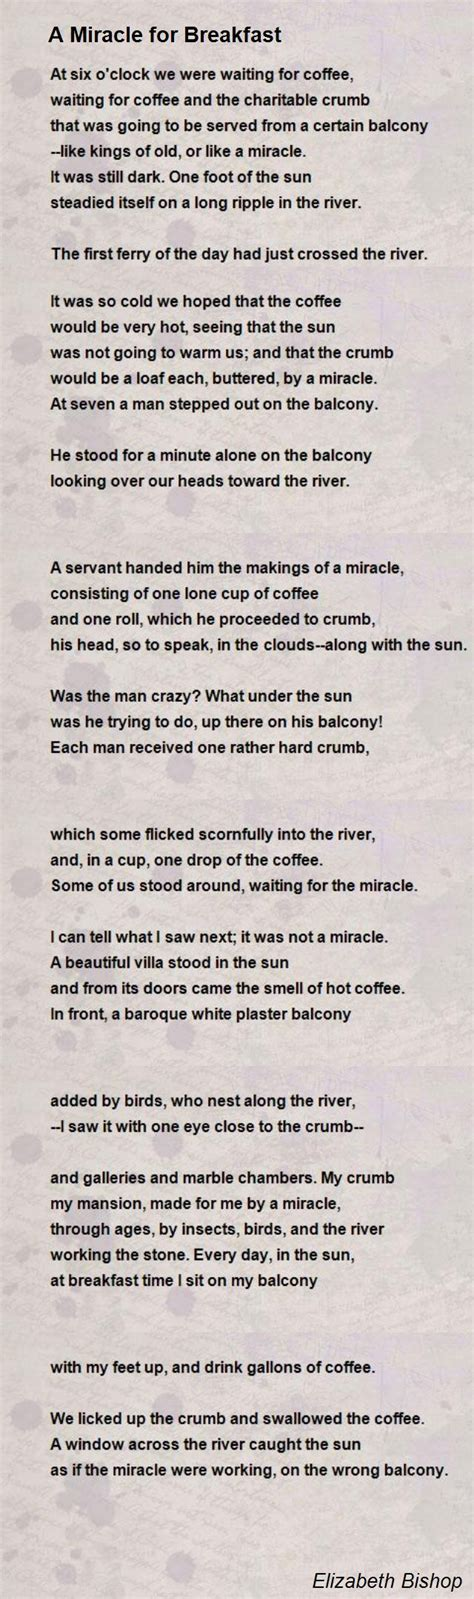 elizabeth bishop a miracle for breakfast books a miracle for breakfast poem by elizabeth bishop poem